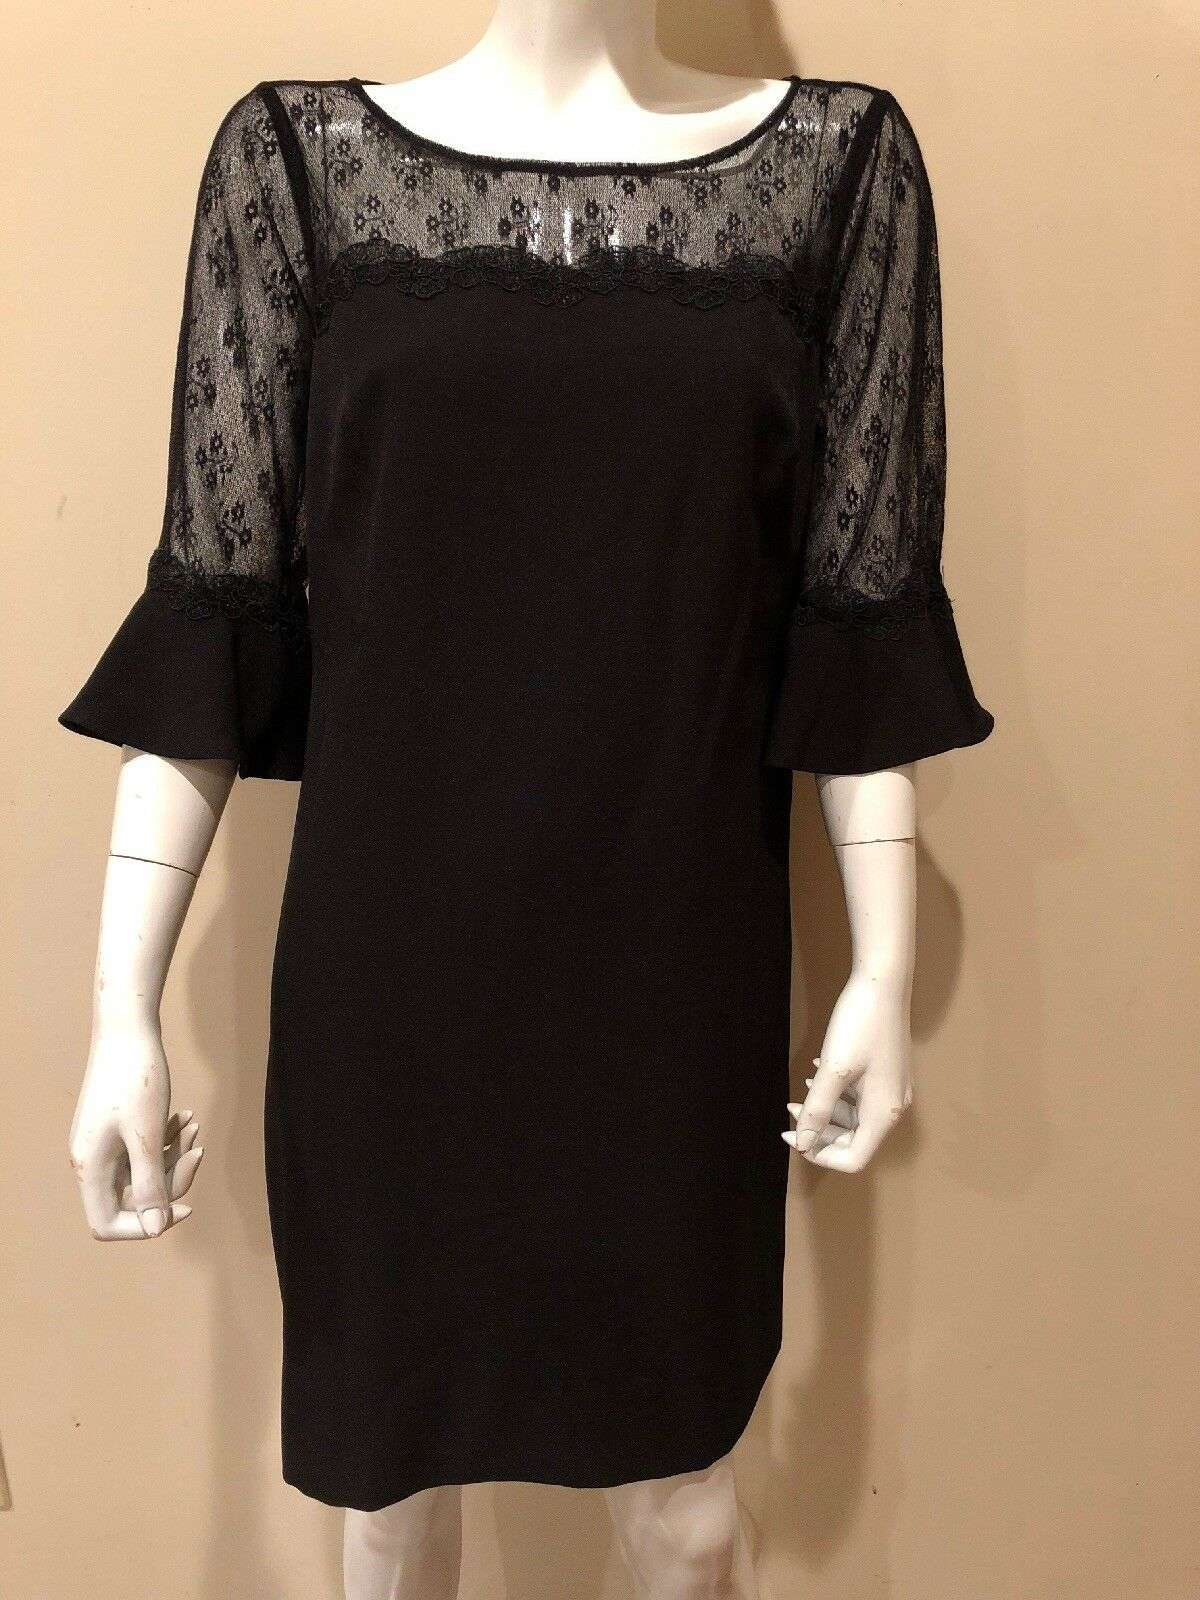 Adrianna Papell Lace Illusion 3 4 bell sleeve Sz 10 schwarz dress  New